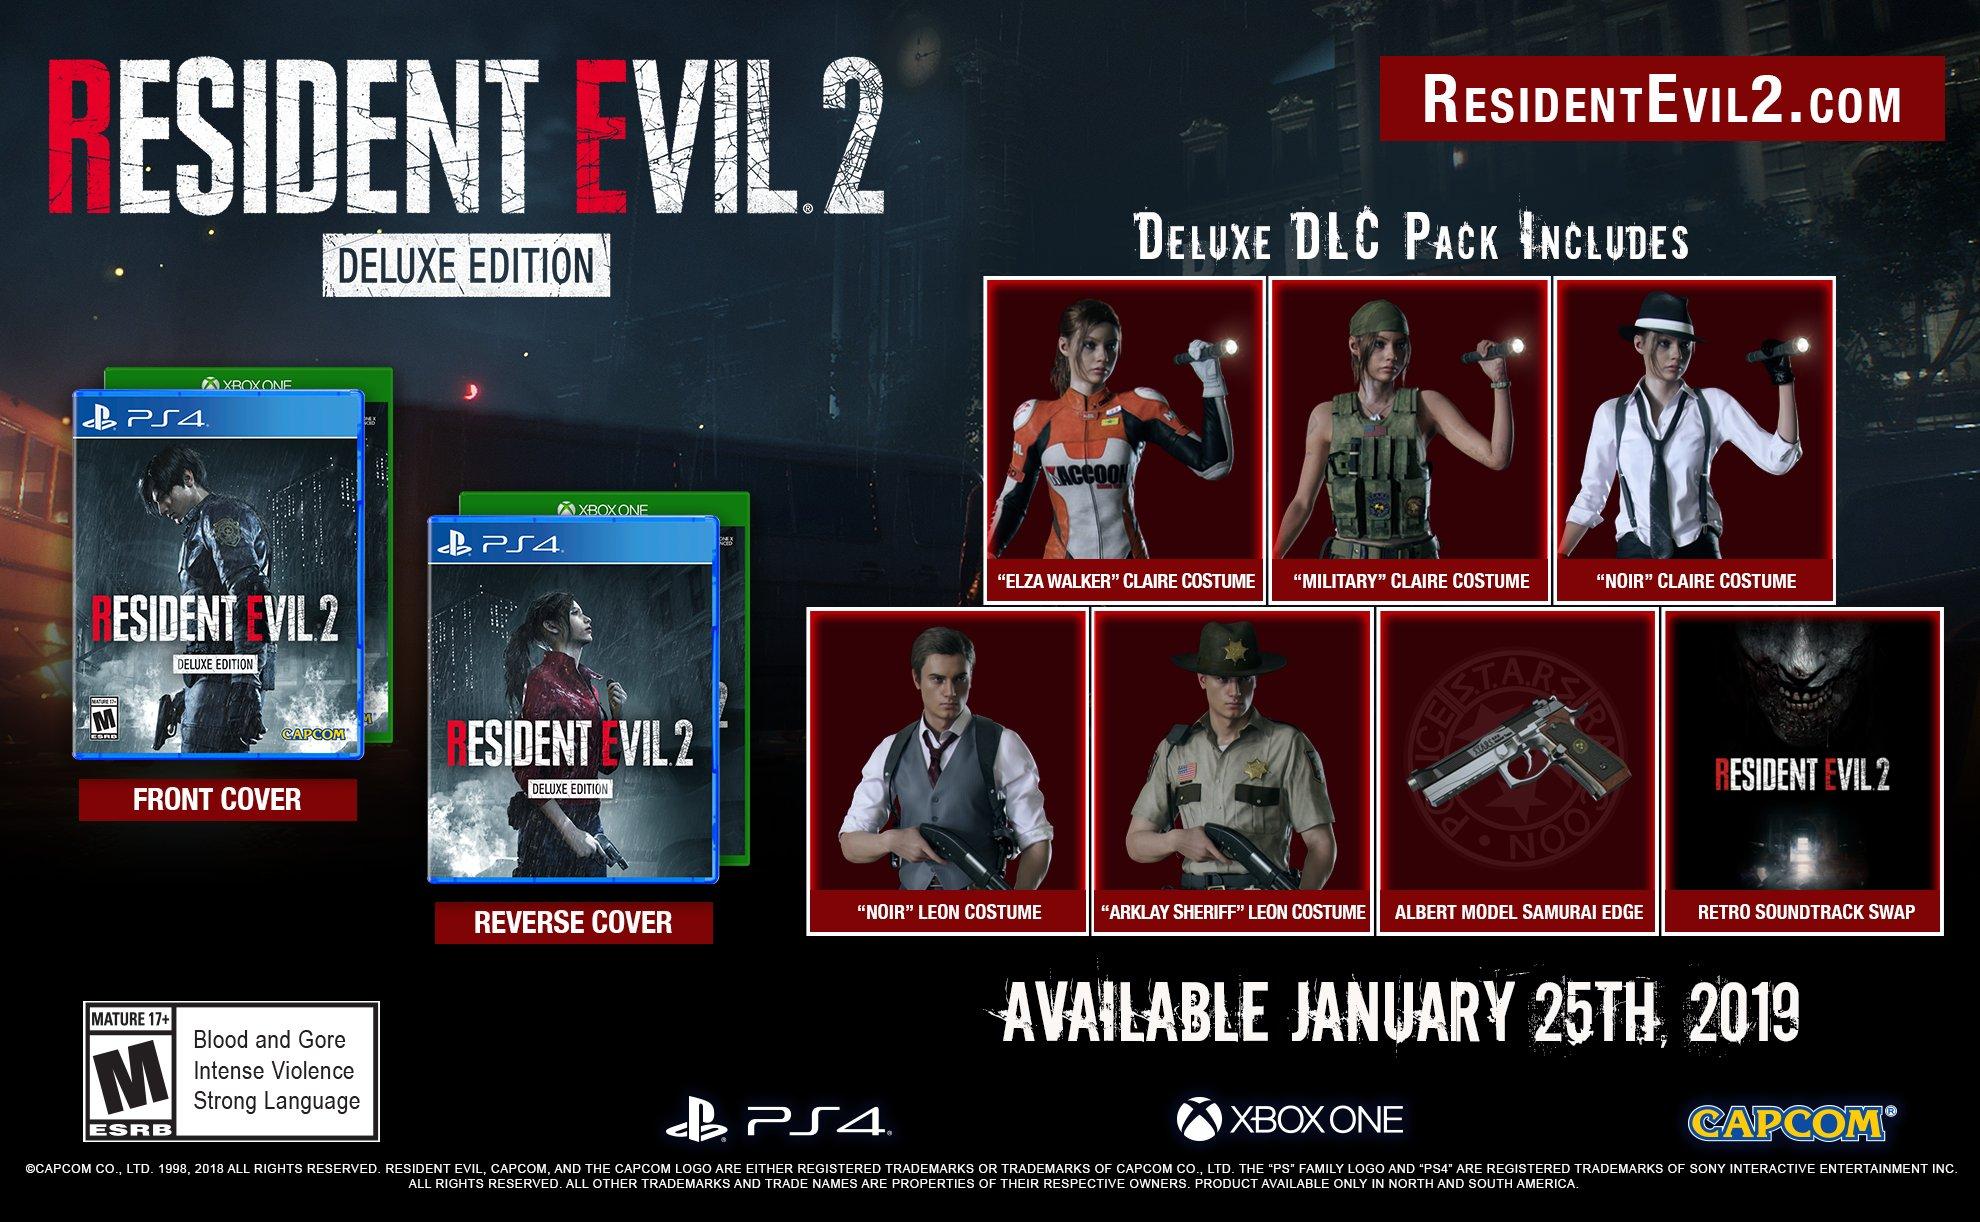 sjlyodda.jpg - Resident Evil 2